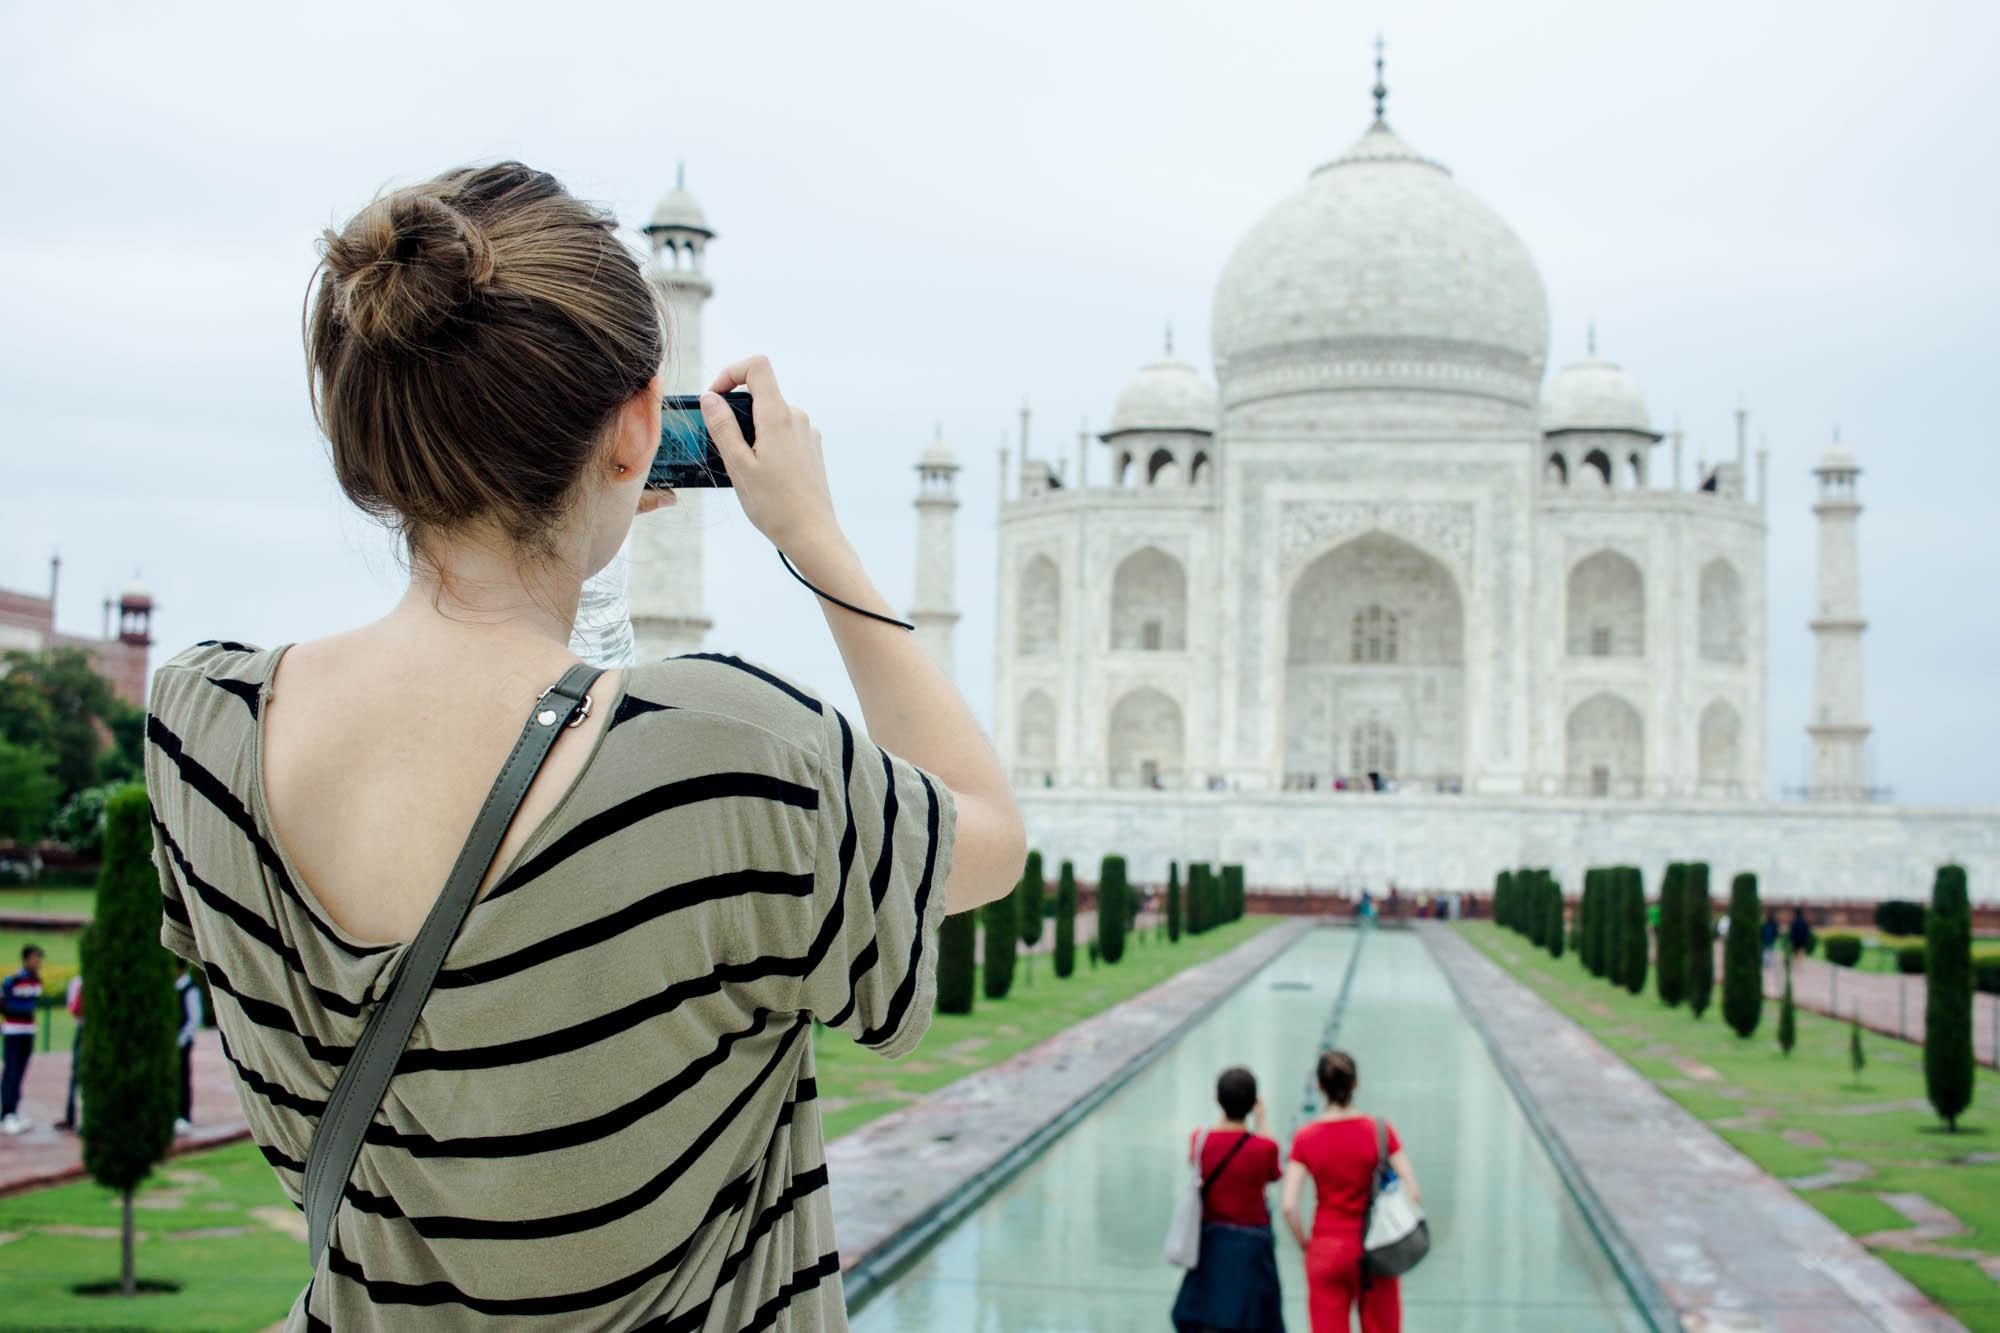 golden triangle rajasthan taj mahal jaipur delhi india tips must see kathi kamleitner travelettes-27